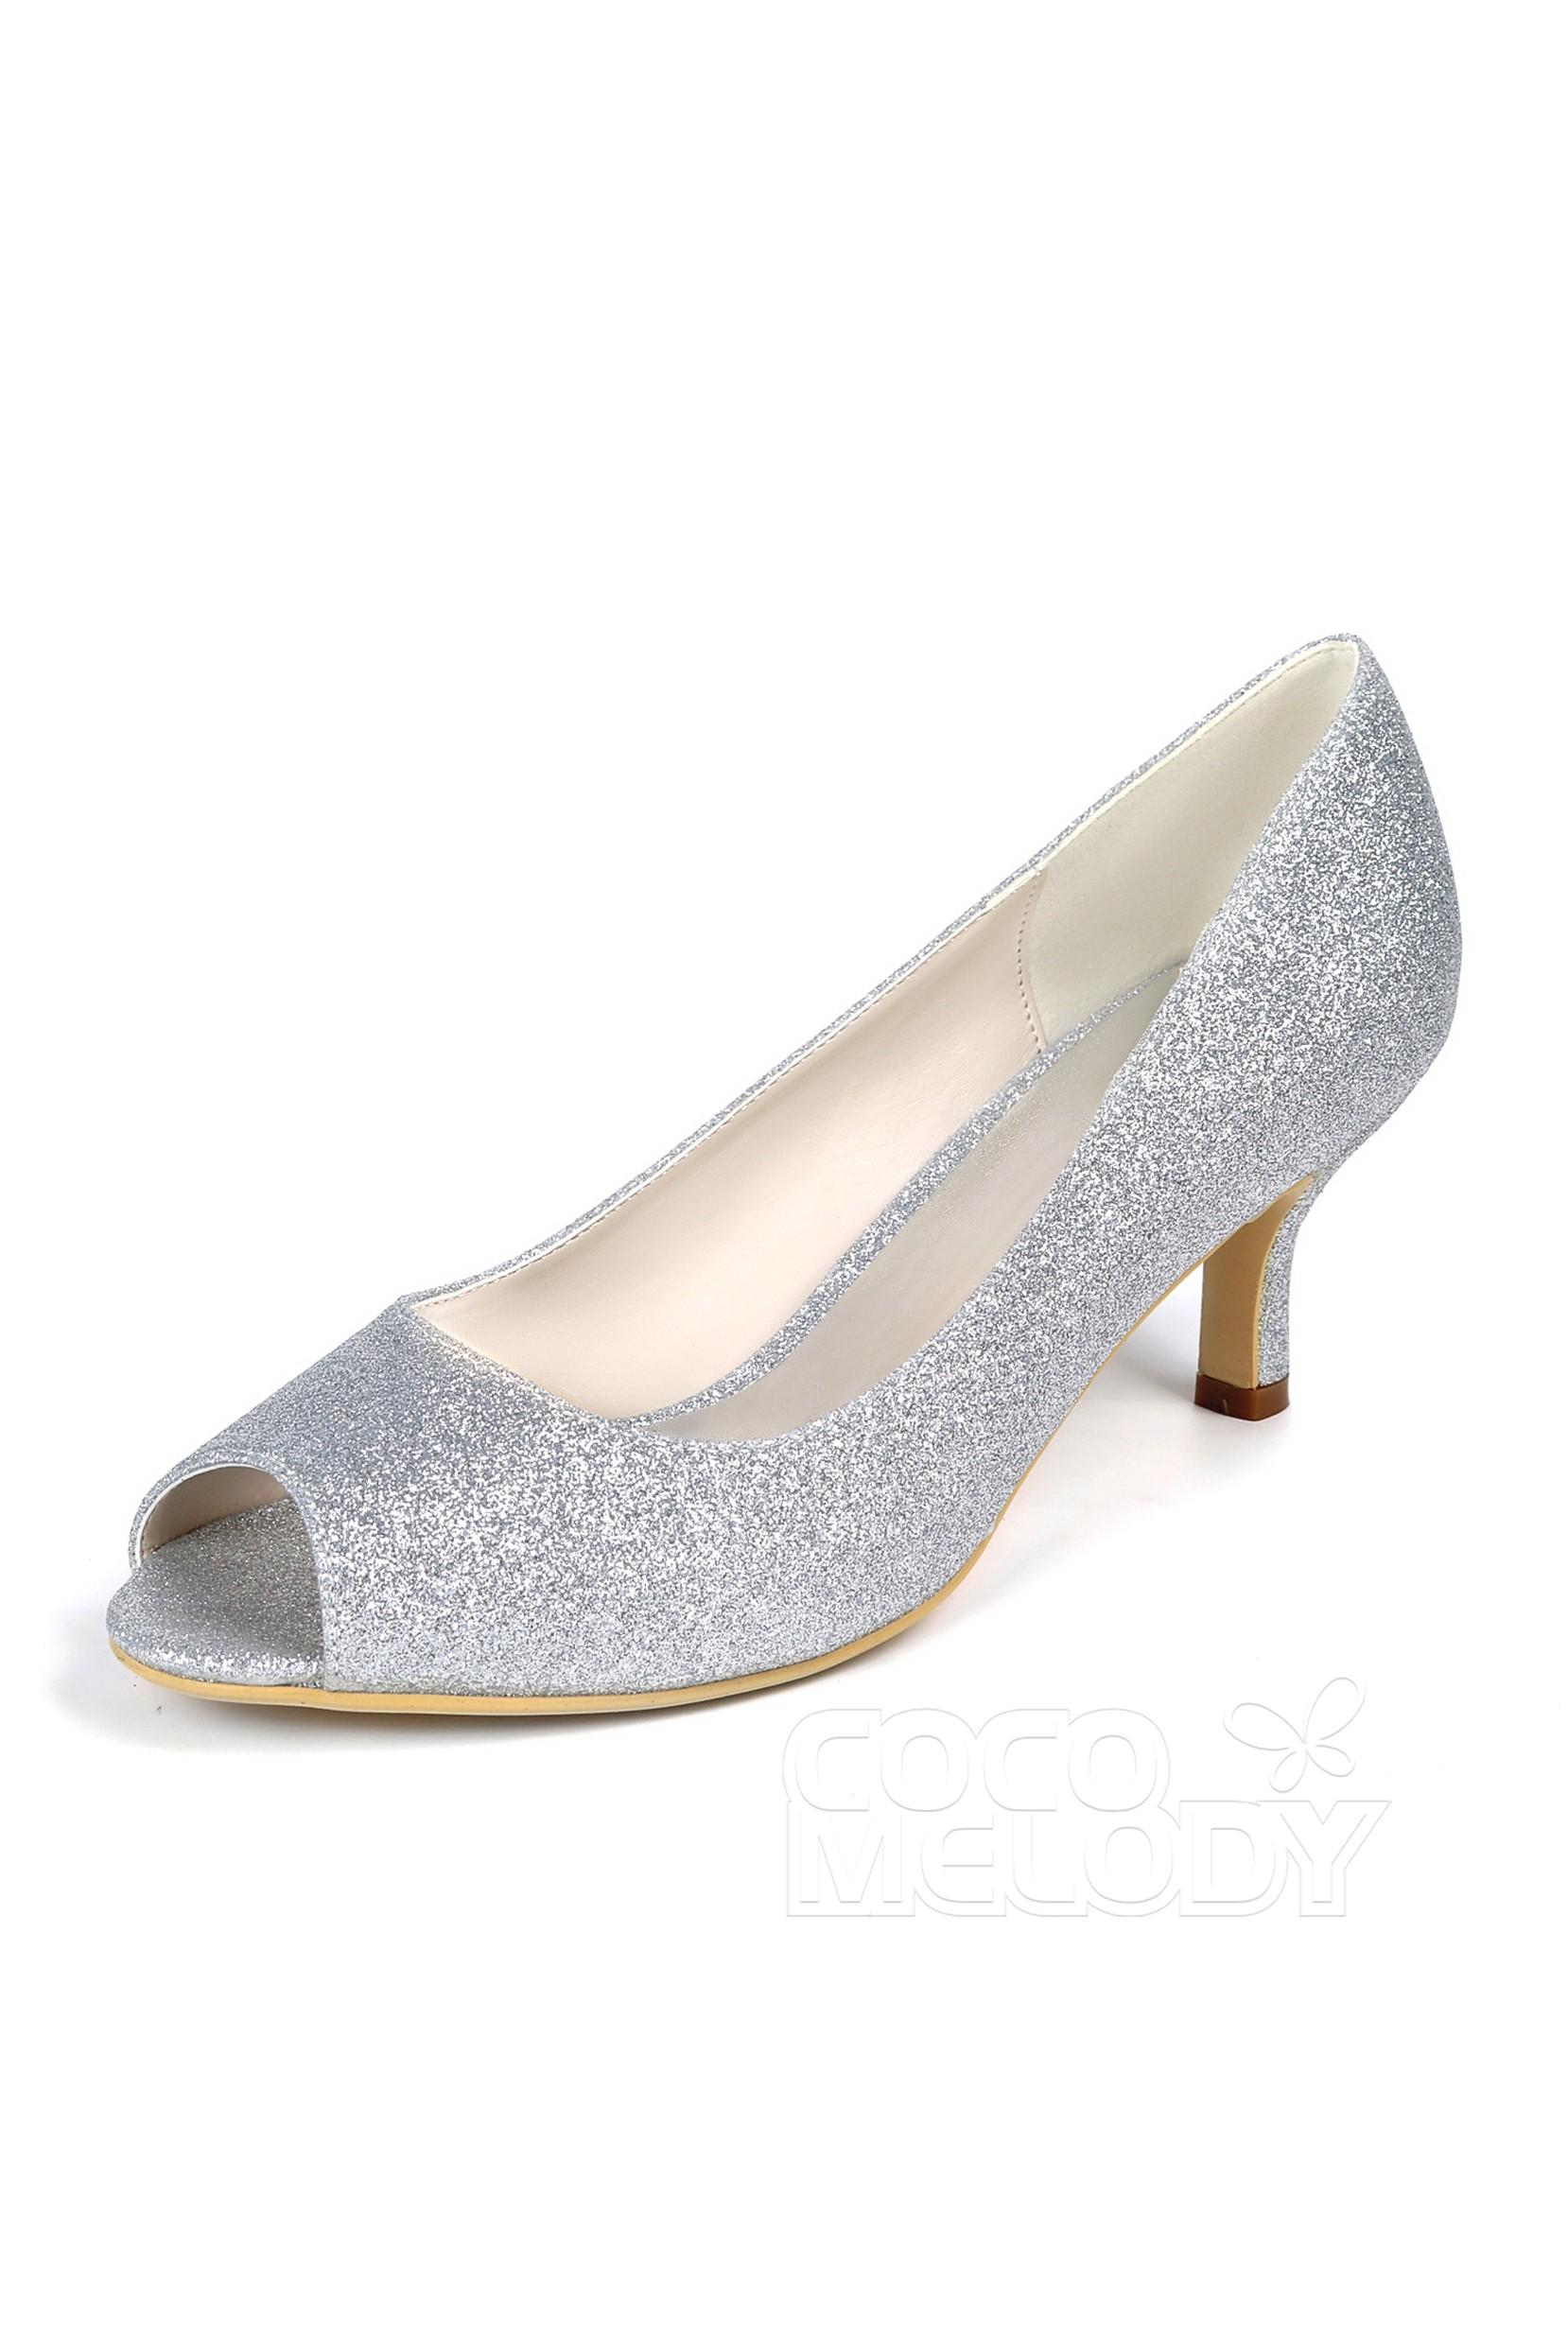 peep toe small heel